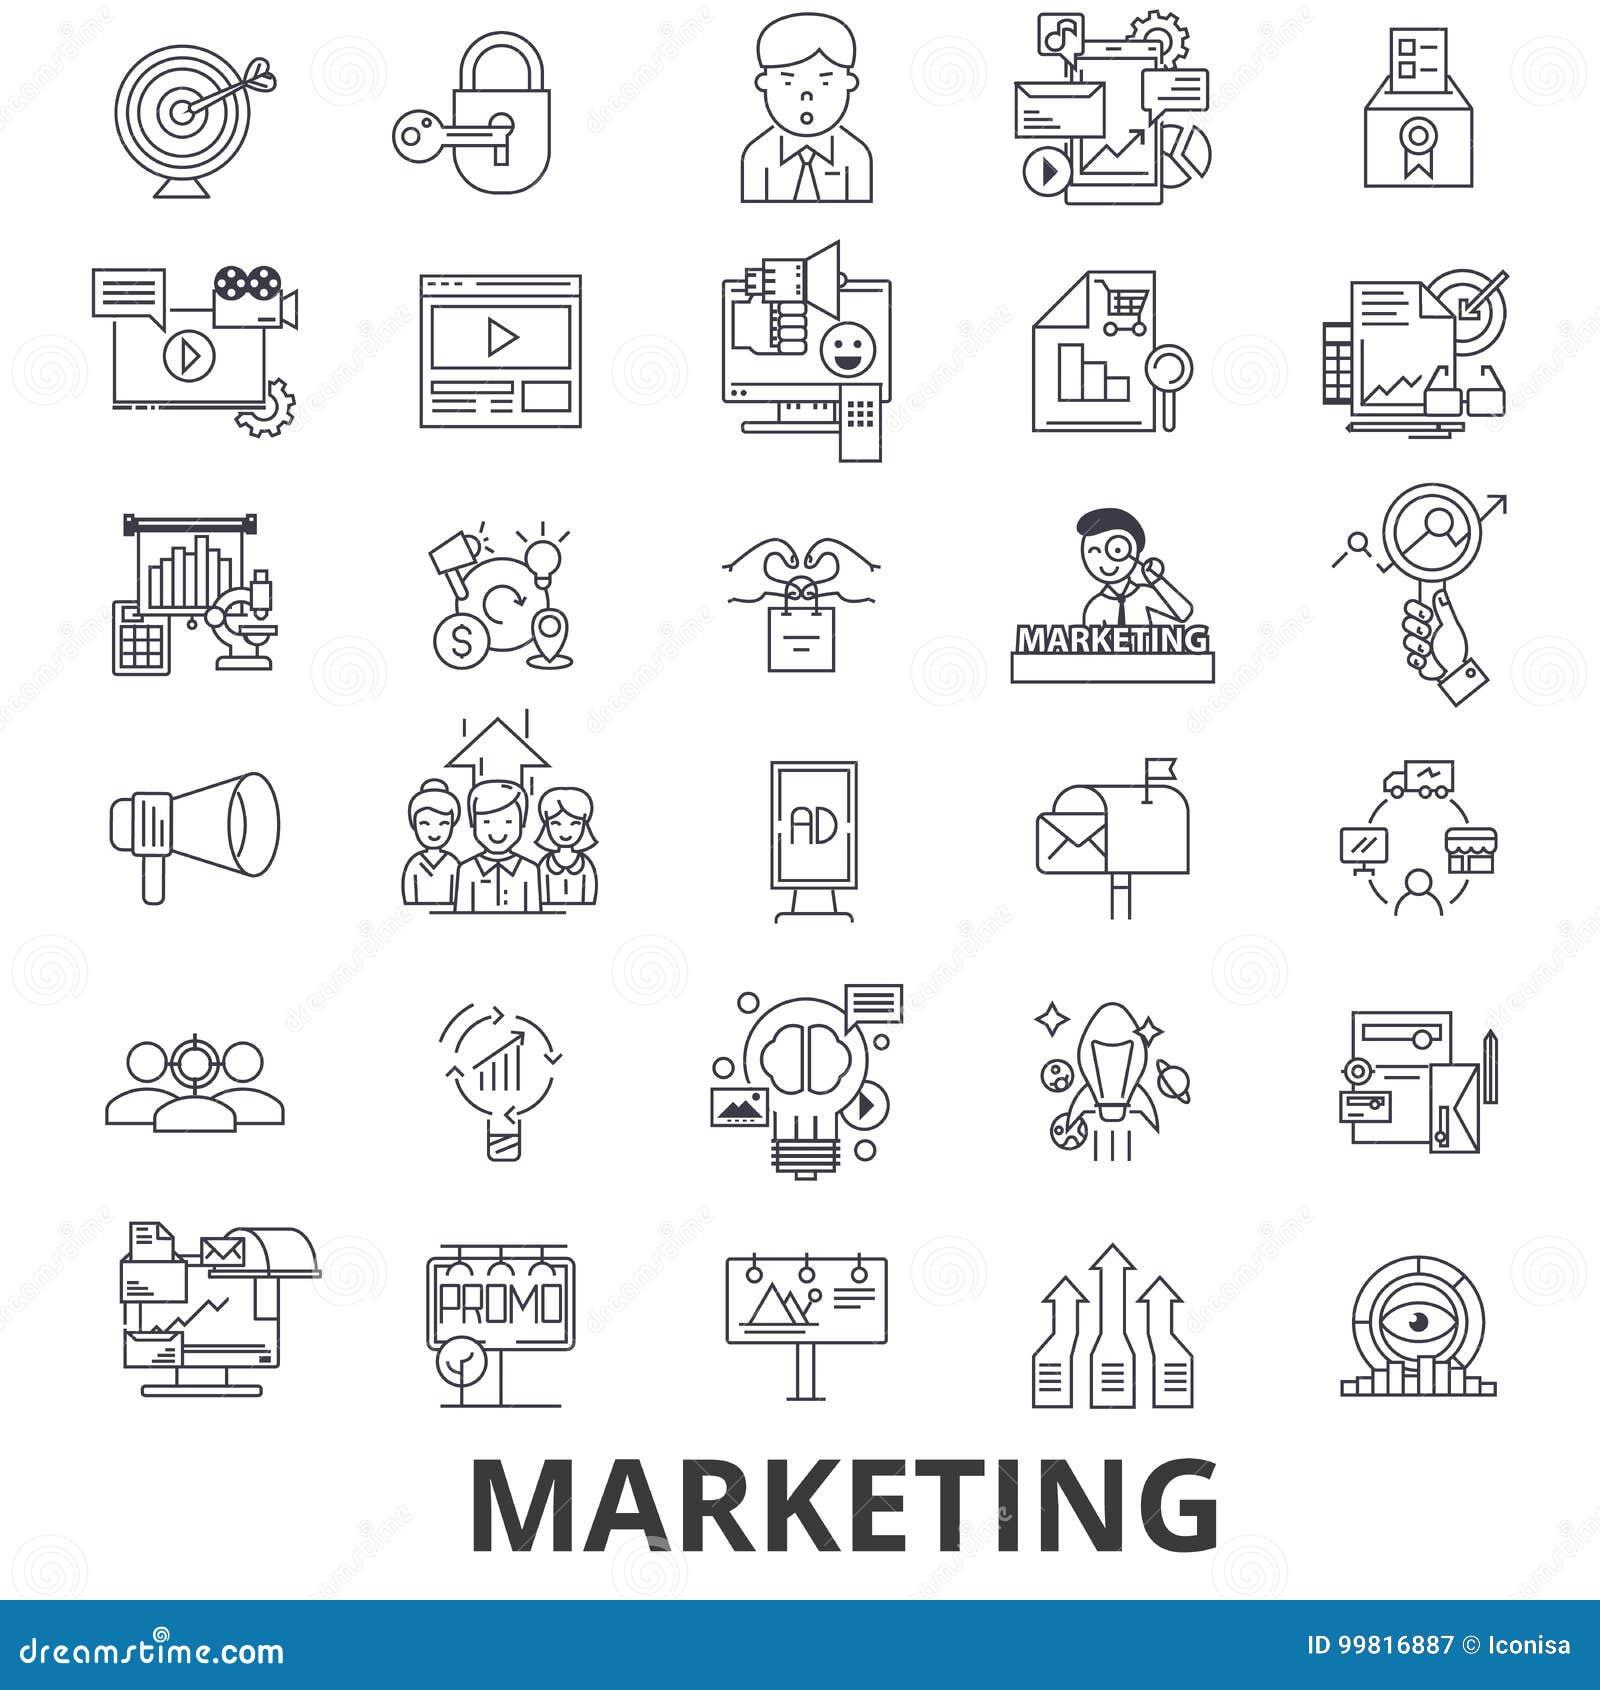 Marketing, marketing strategy, advertising, business, branding, social media line icons. Editable strokes. Flat design